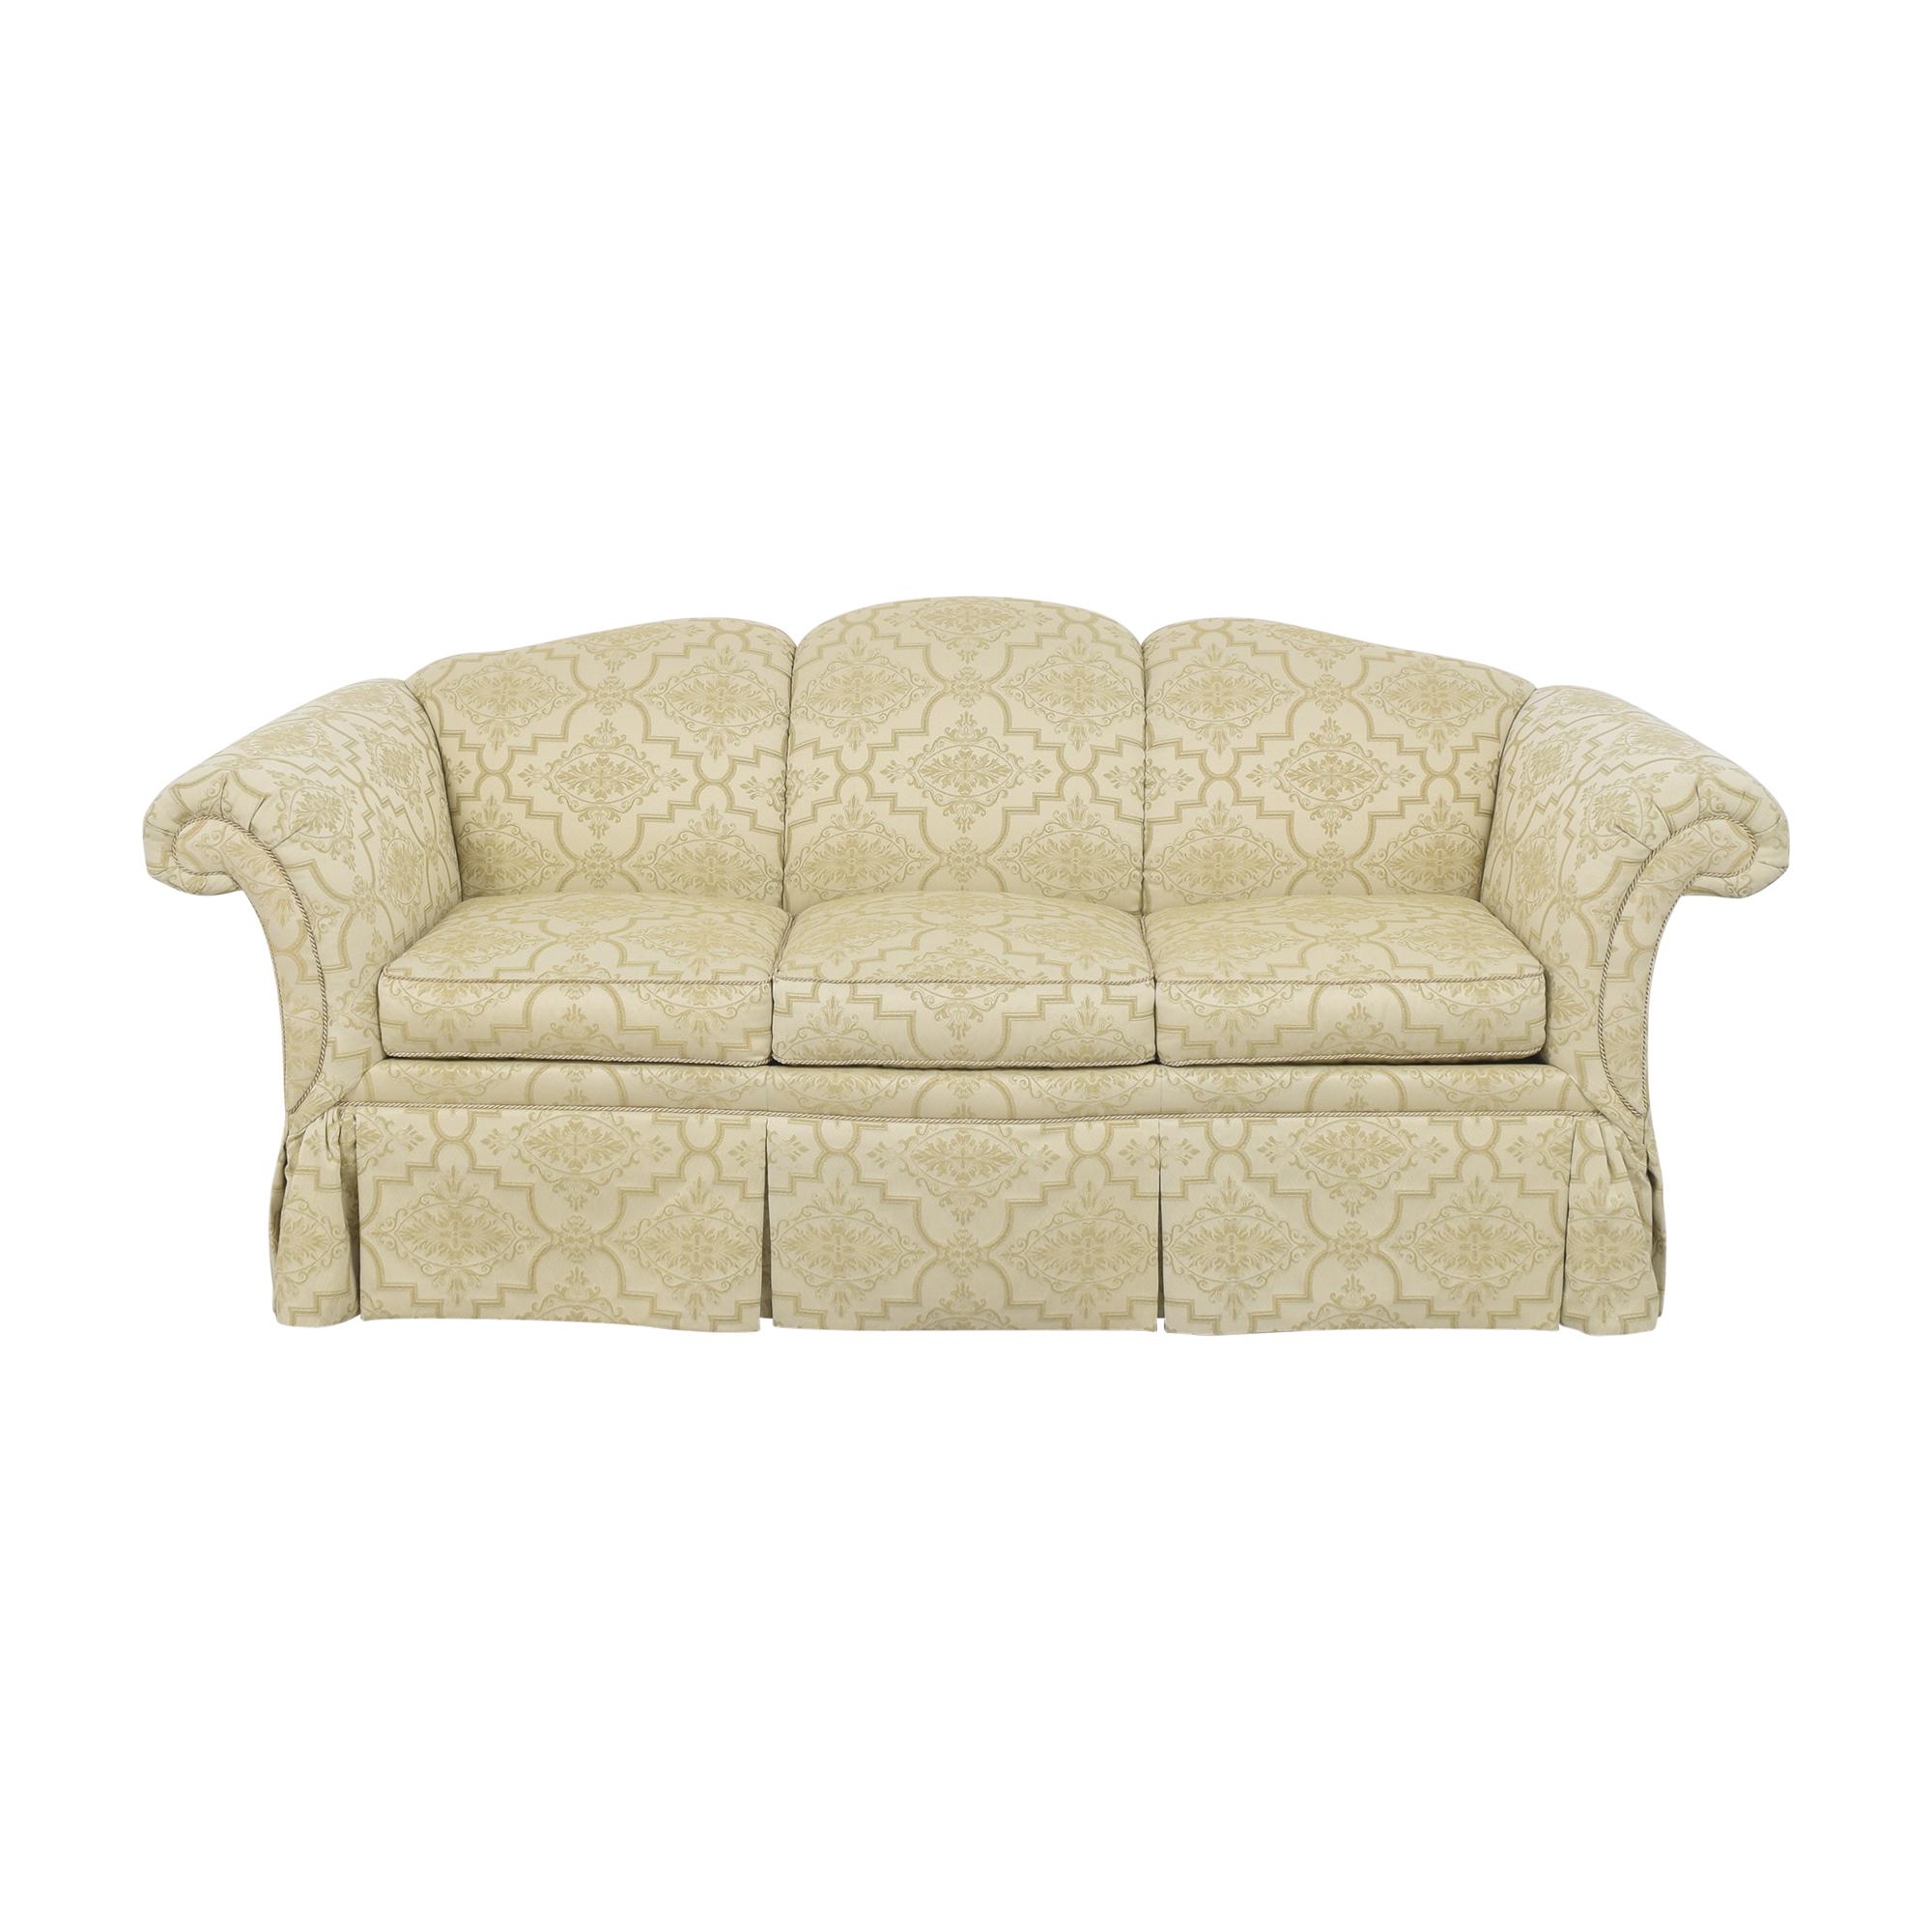 Charles Stewart Company Camelback Sofa sale